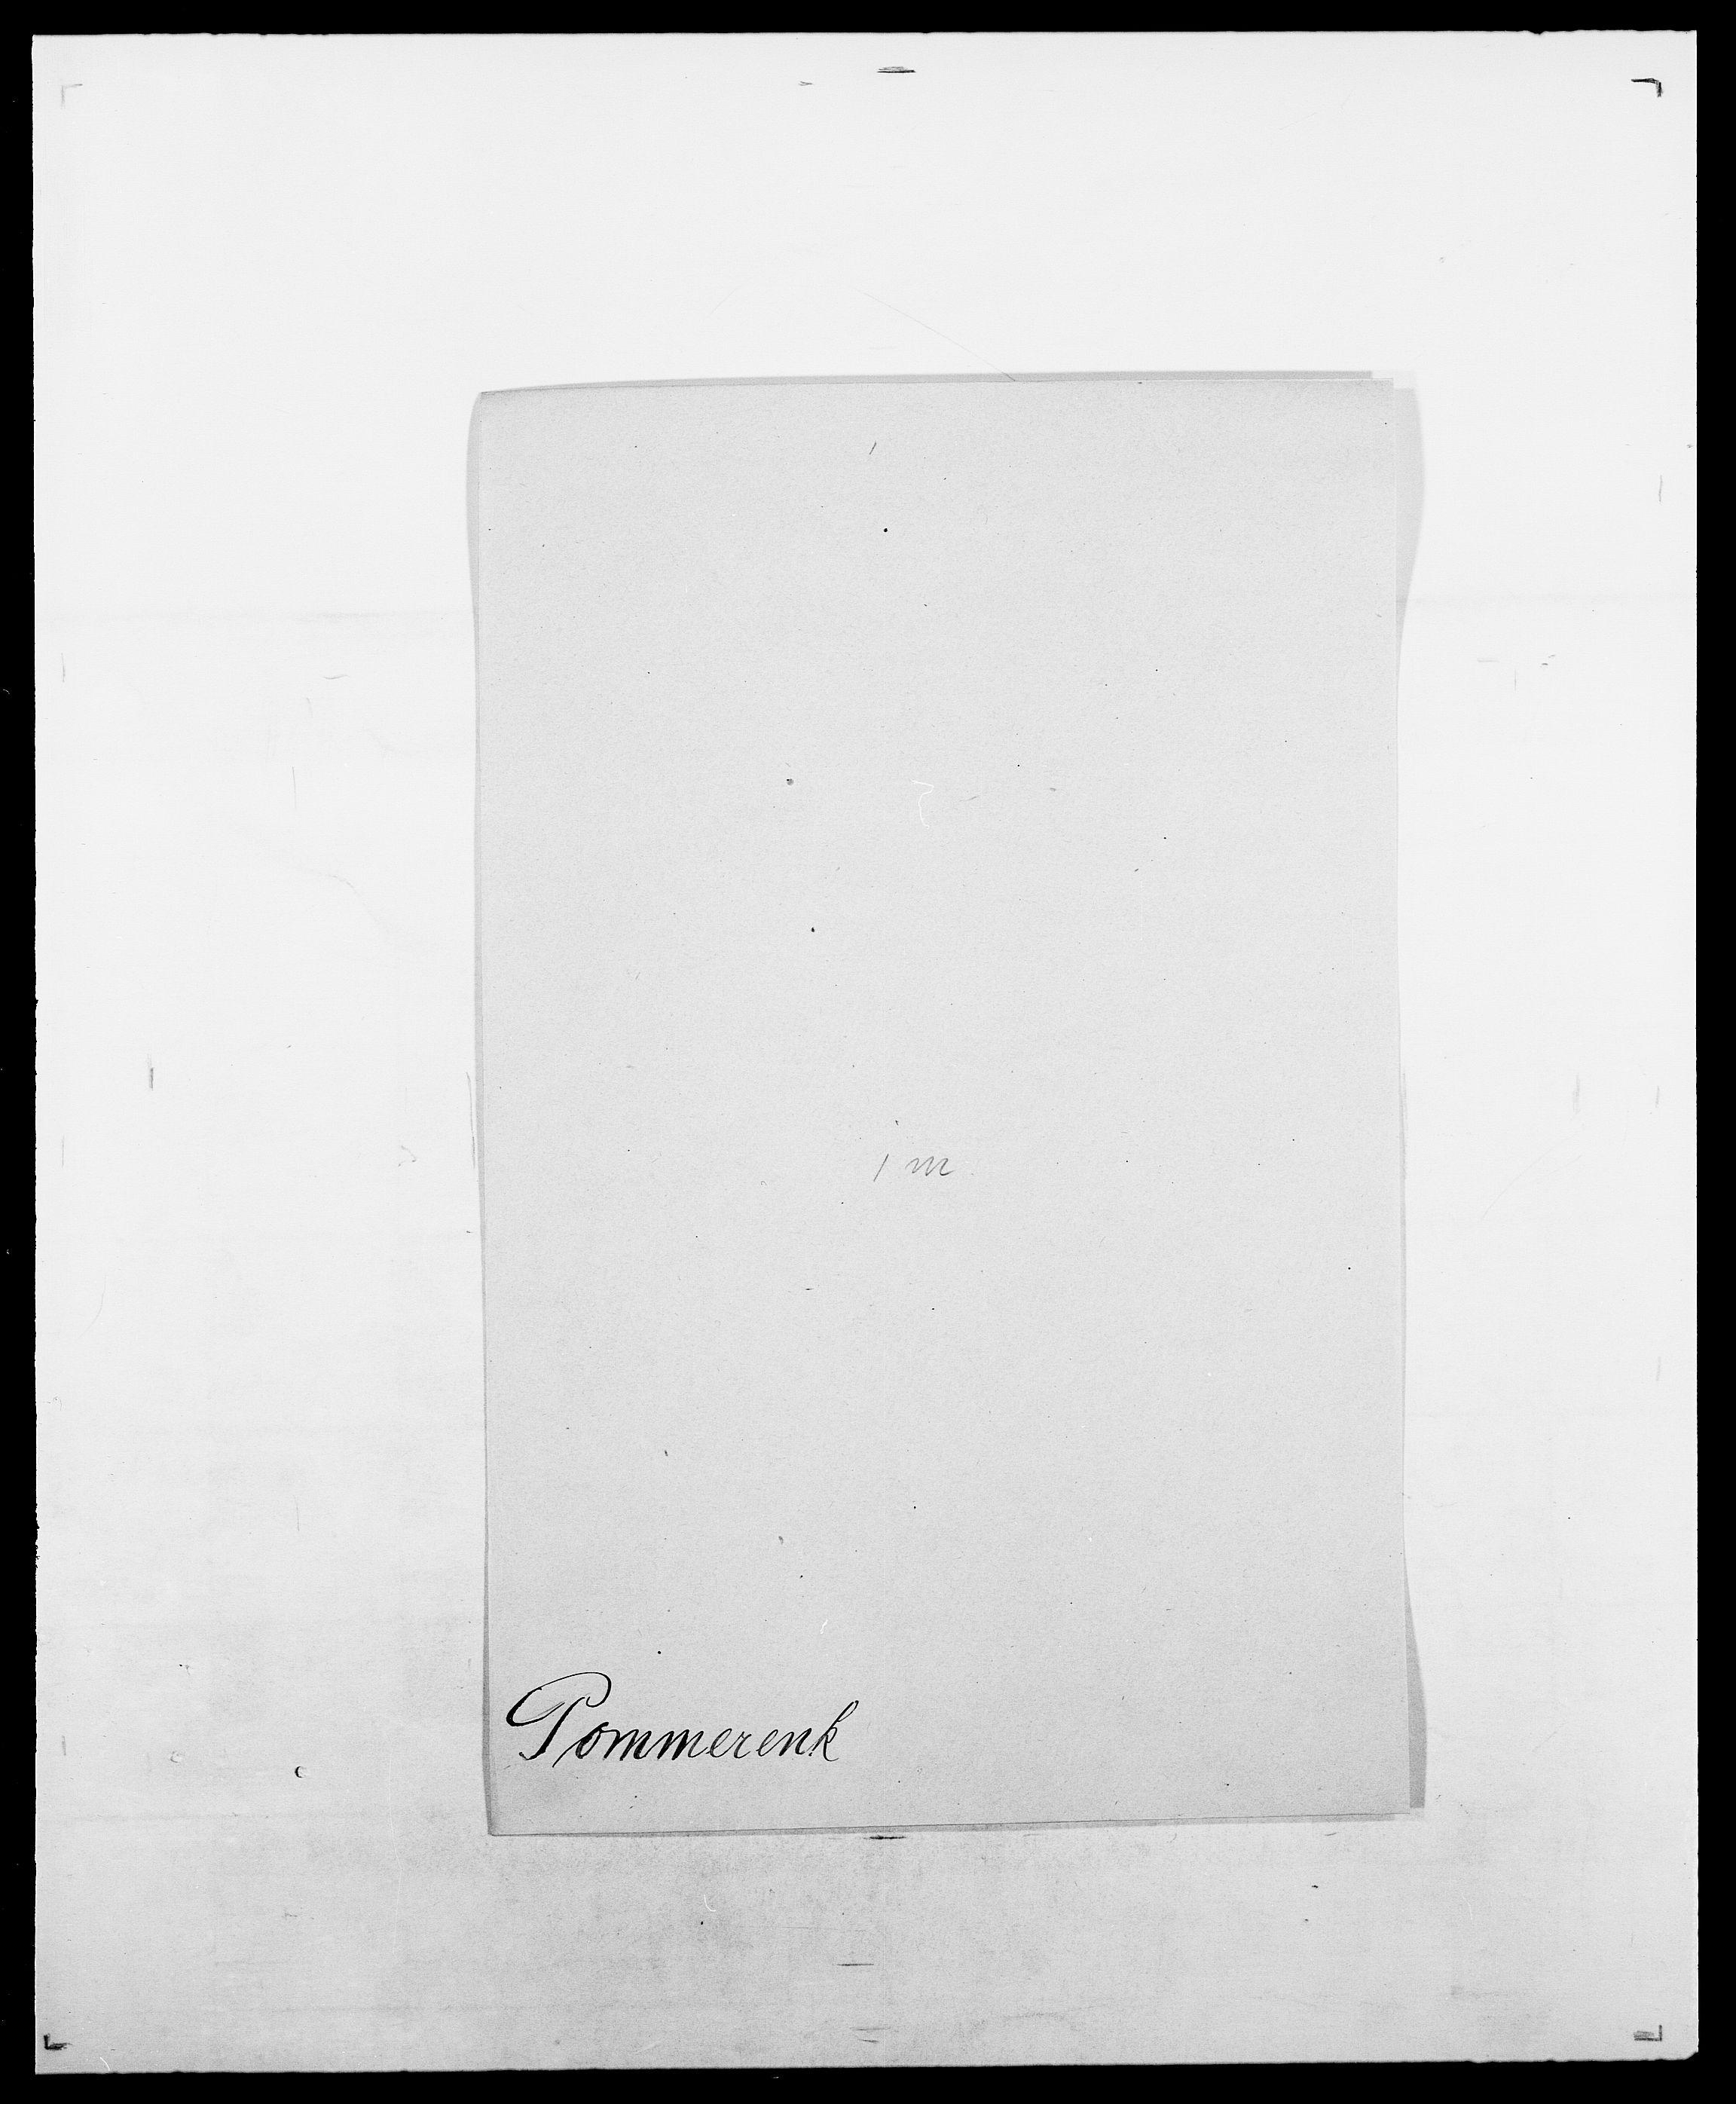 SAO, Delgobe, Charles Antoine - samling, D/Da/L0031: de Place - Raaum, s. 202